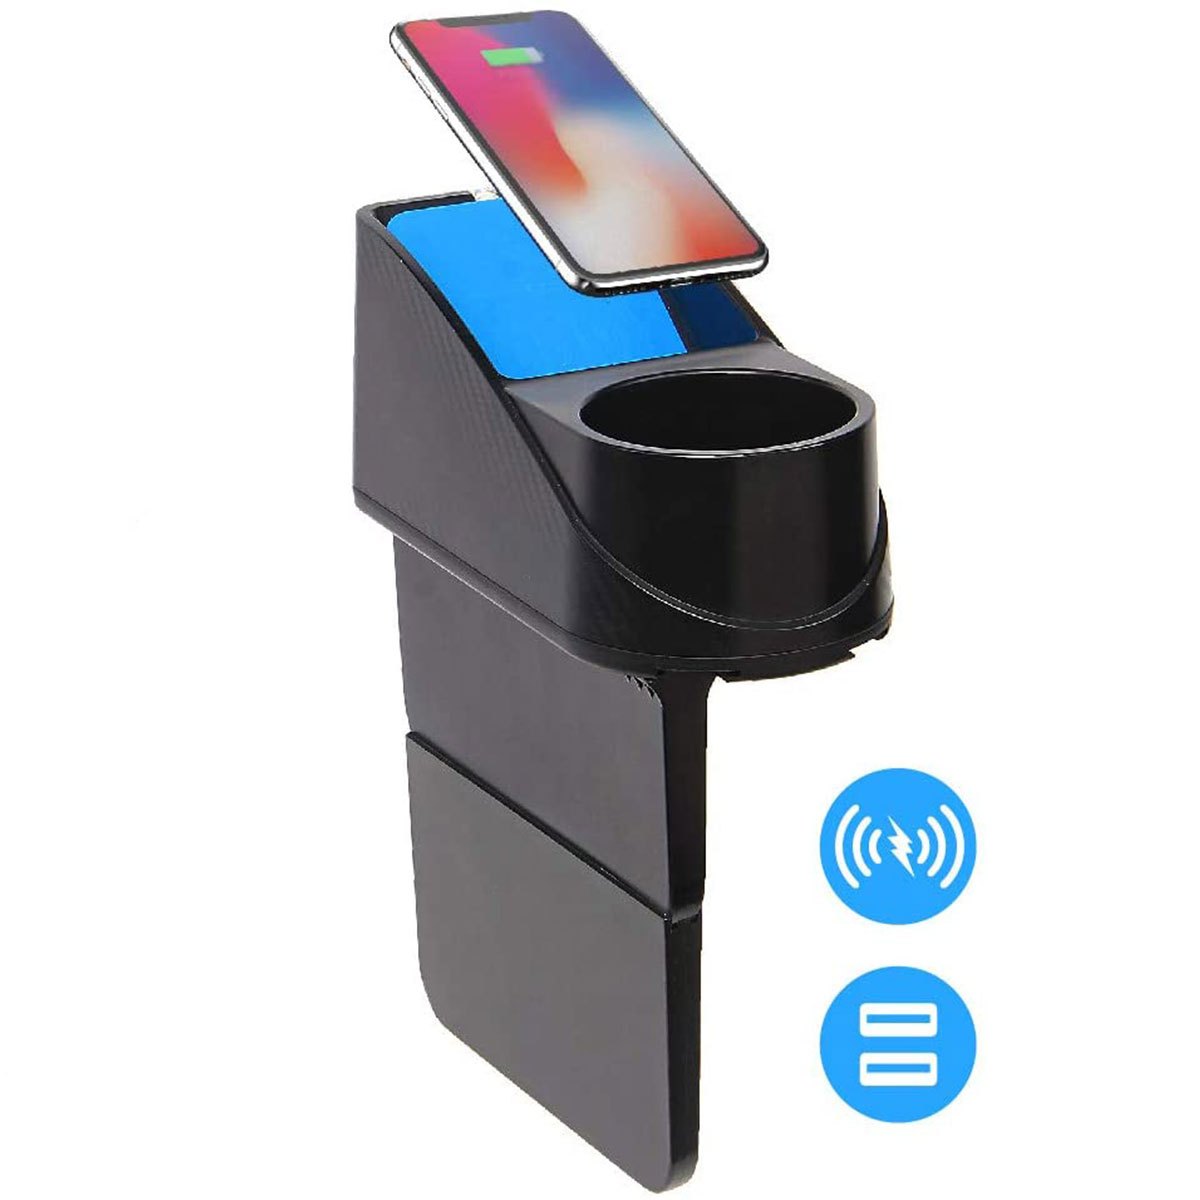 Auto Wireless-Ladegerät mit Getränkehalter Kompatibel mit iPhone 11, XS, X 8 uvm